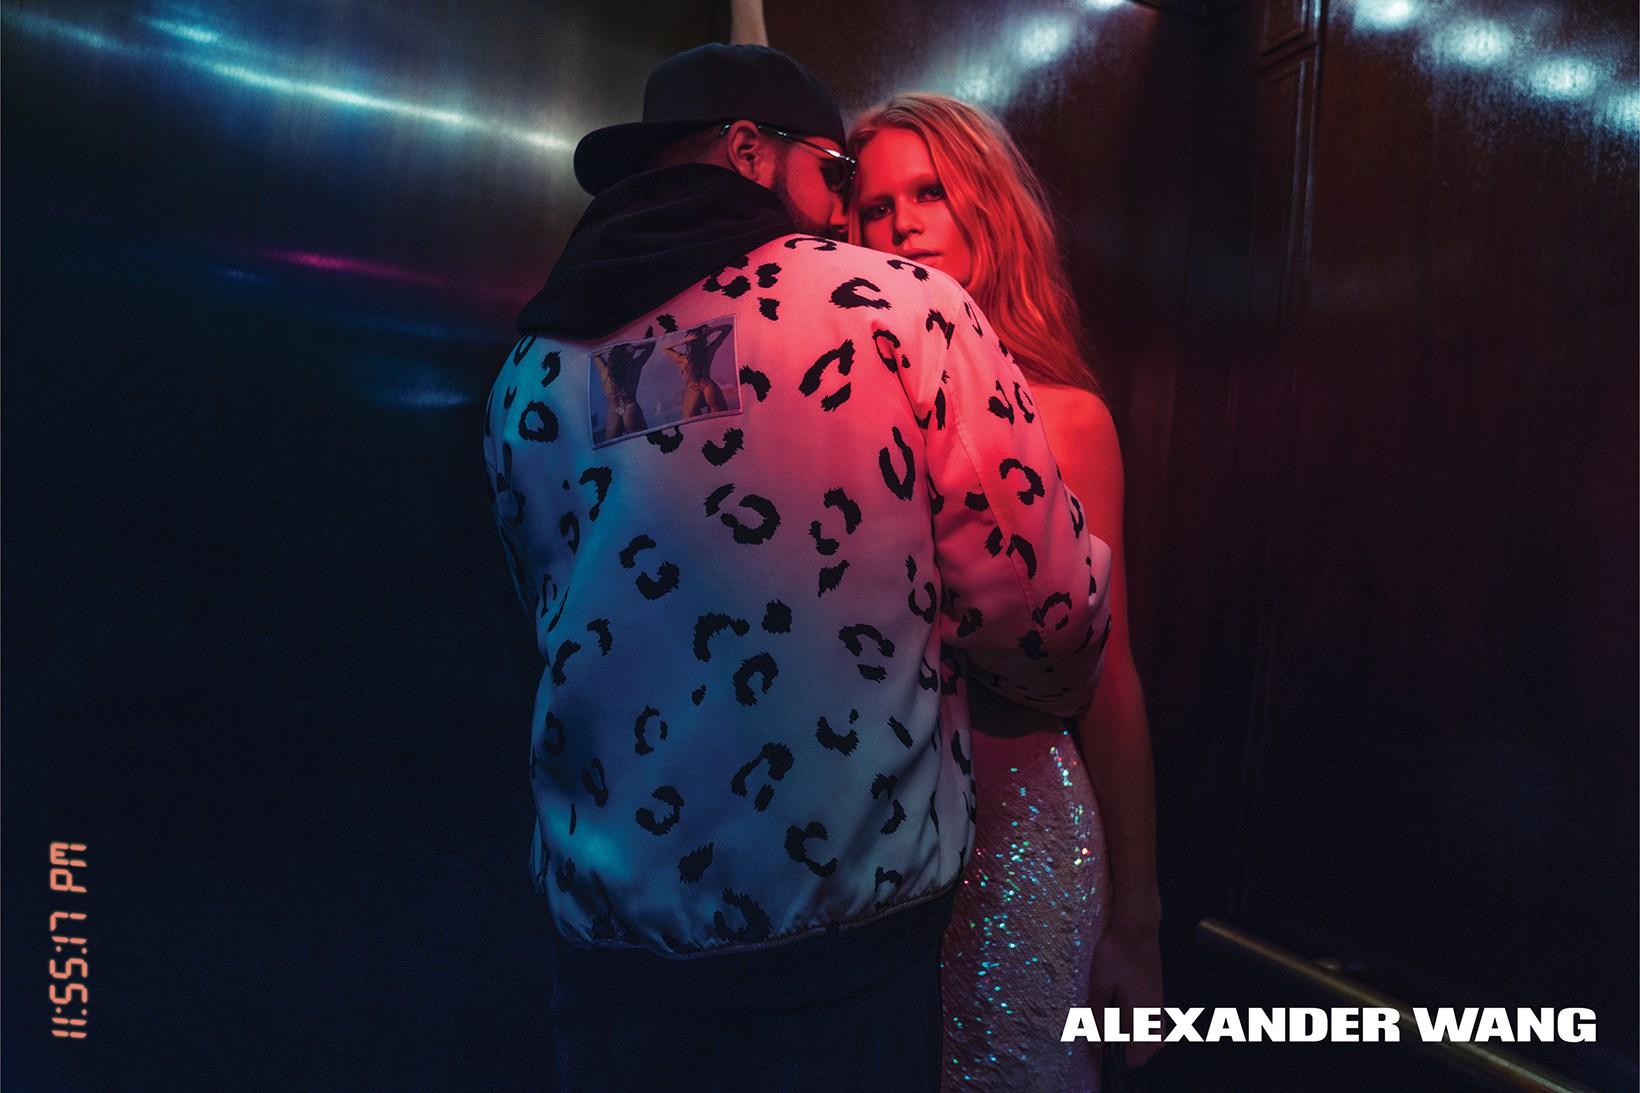 alexander-wang-inez-vinoodh-beyond-reality-campaign-3